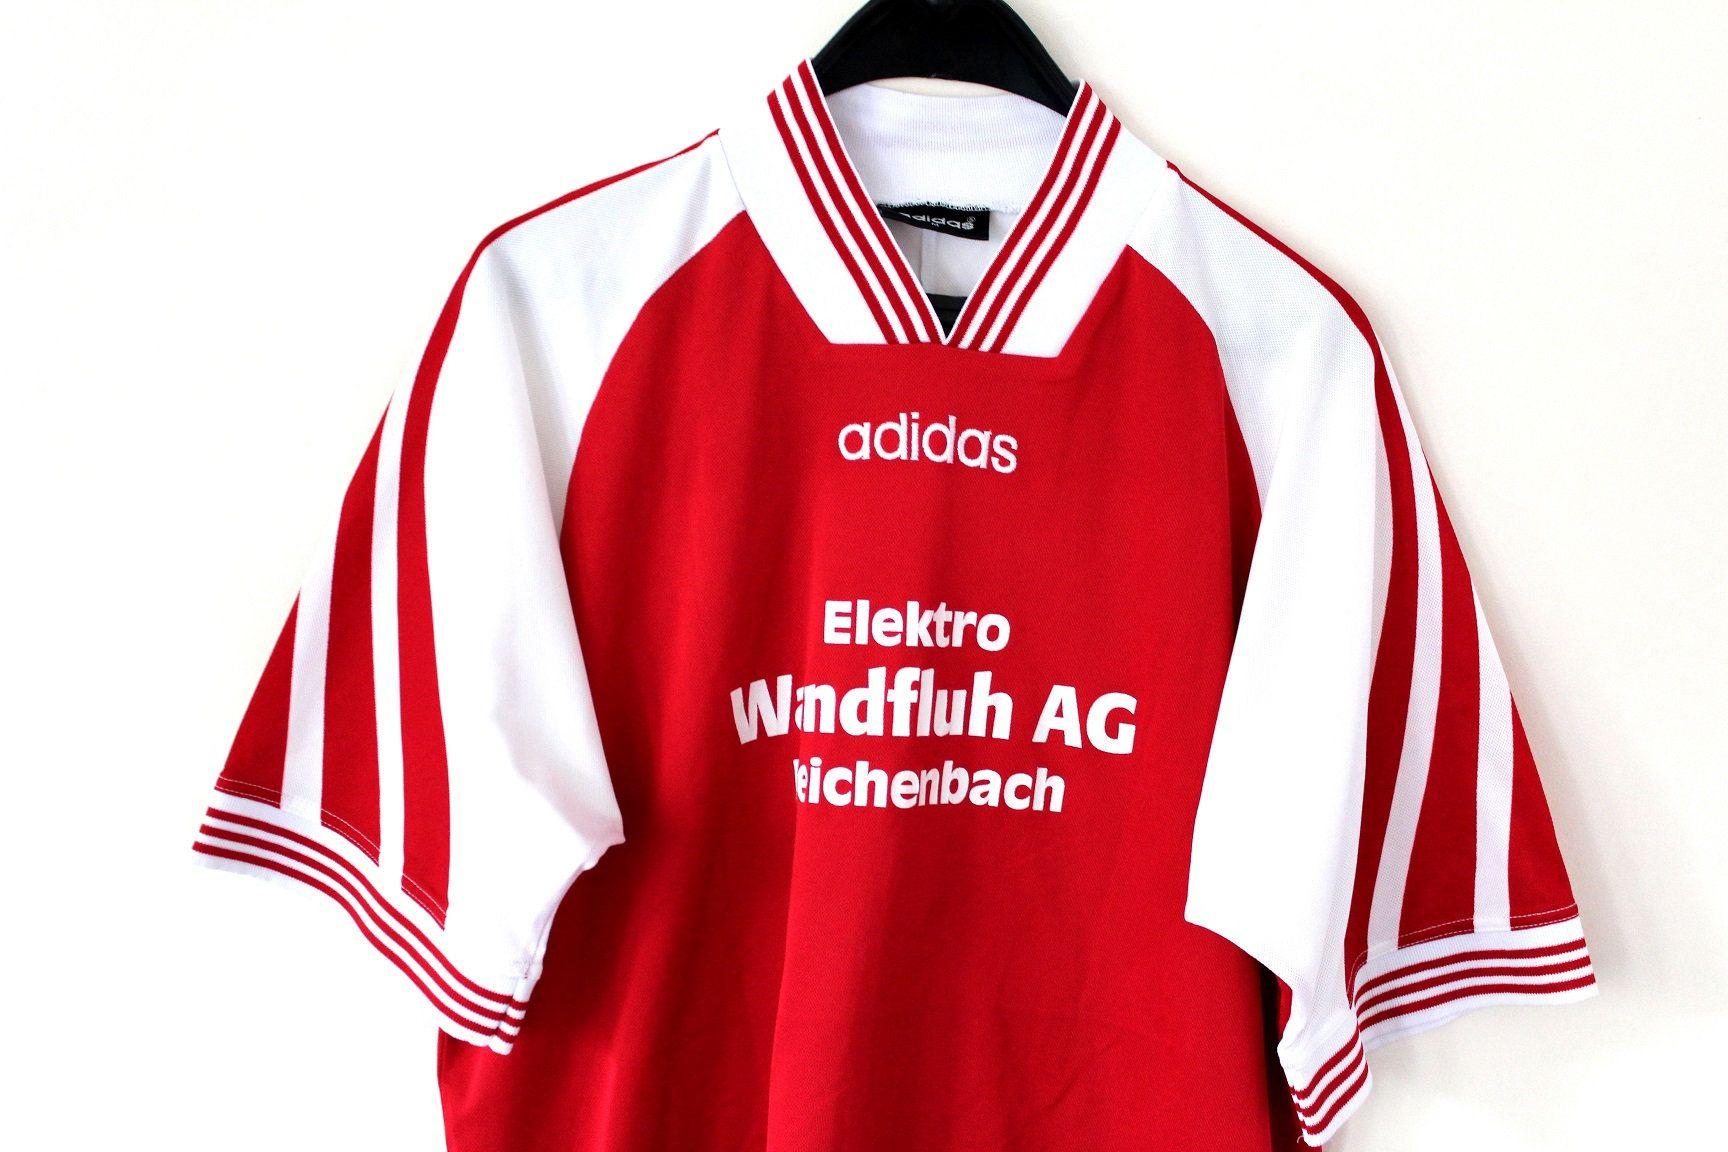 90 S Football Shirt Made In Portugal Vintage Adidas Etsy Soccer Shirts Vintage Adidas Baseball Jersey Shirt [ 1152 x 1728 Pixel ]